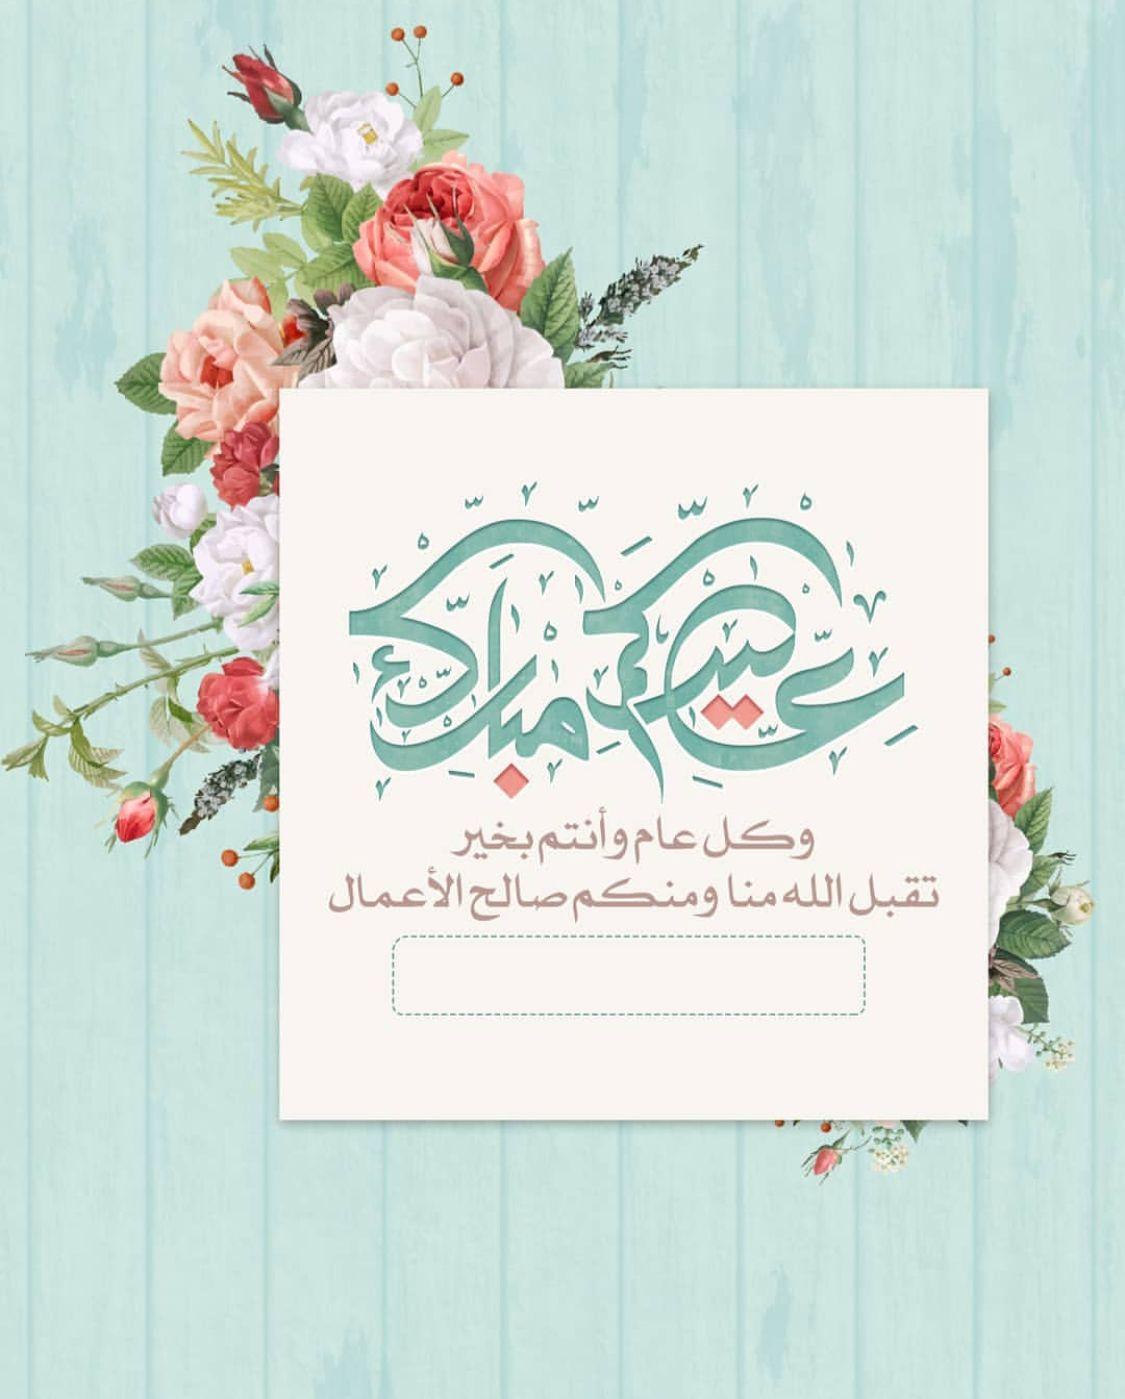 Pin By Toome Habeeb On عيد الفطر عيد الأضحى Eid Mubark Eid Stickers Eid Card Designs Eid Cards